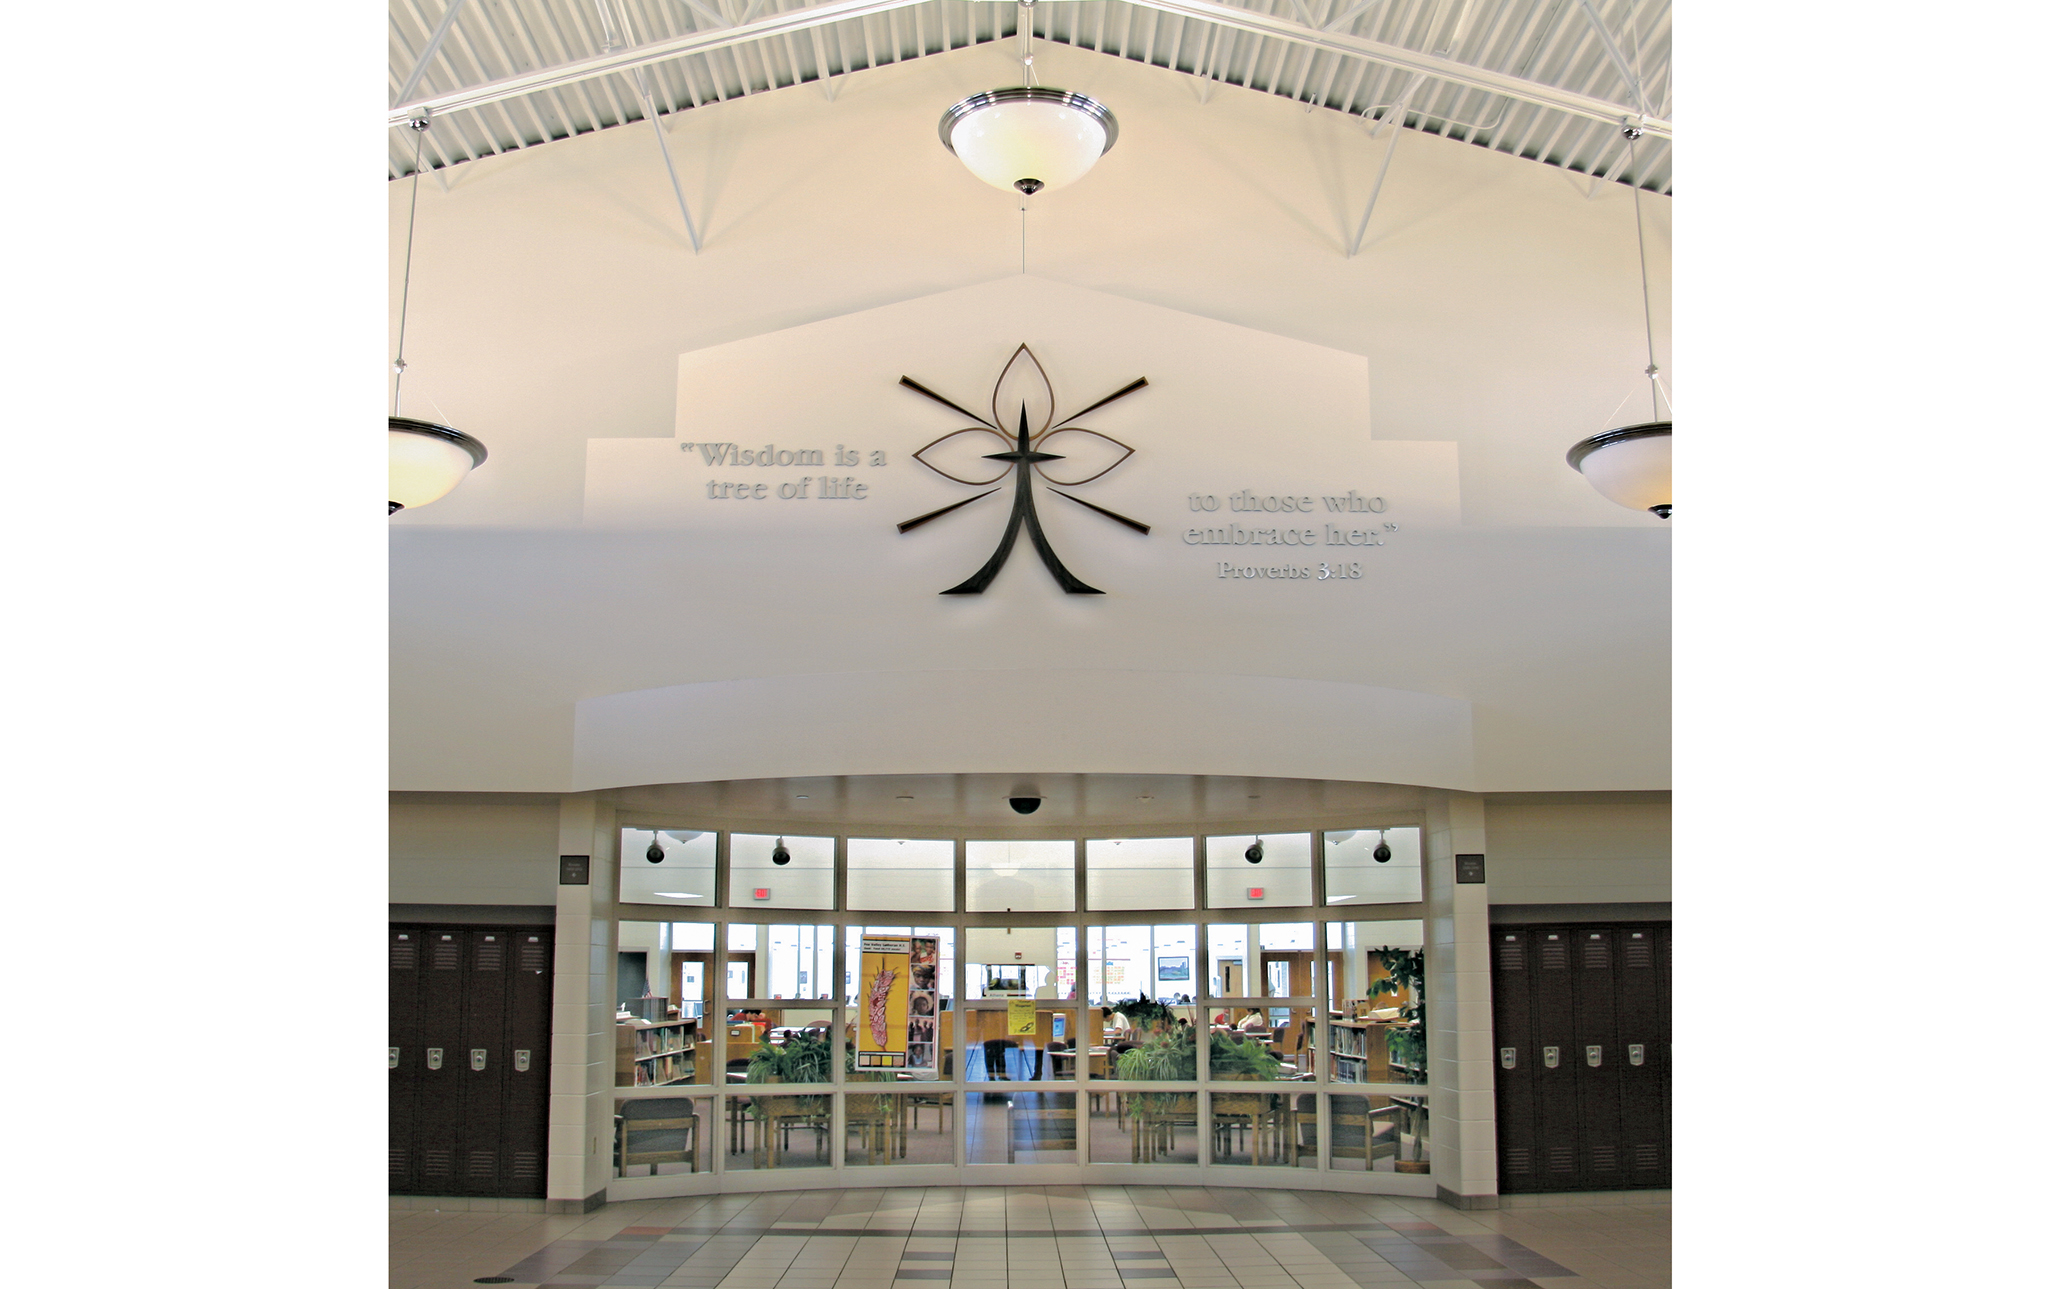 4_Fox-Valley-Lutheran-High-School